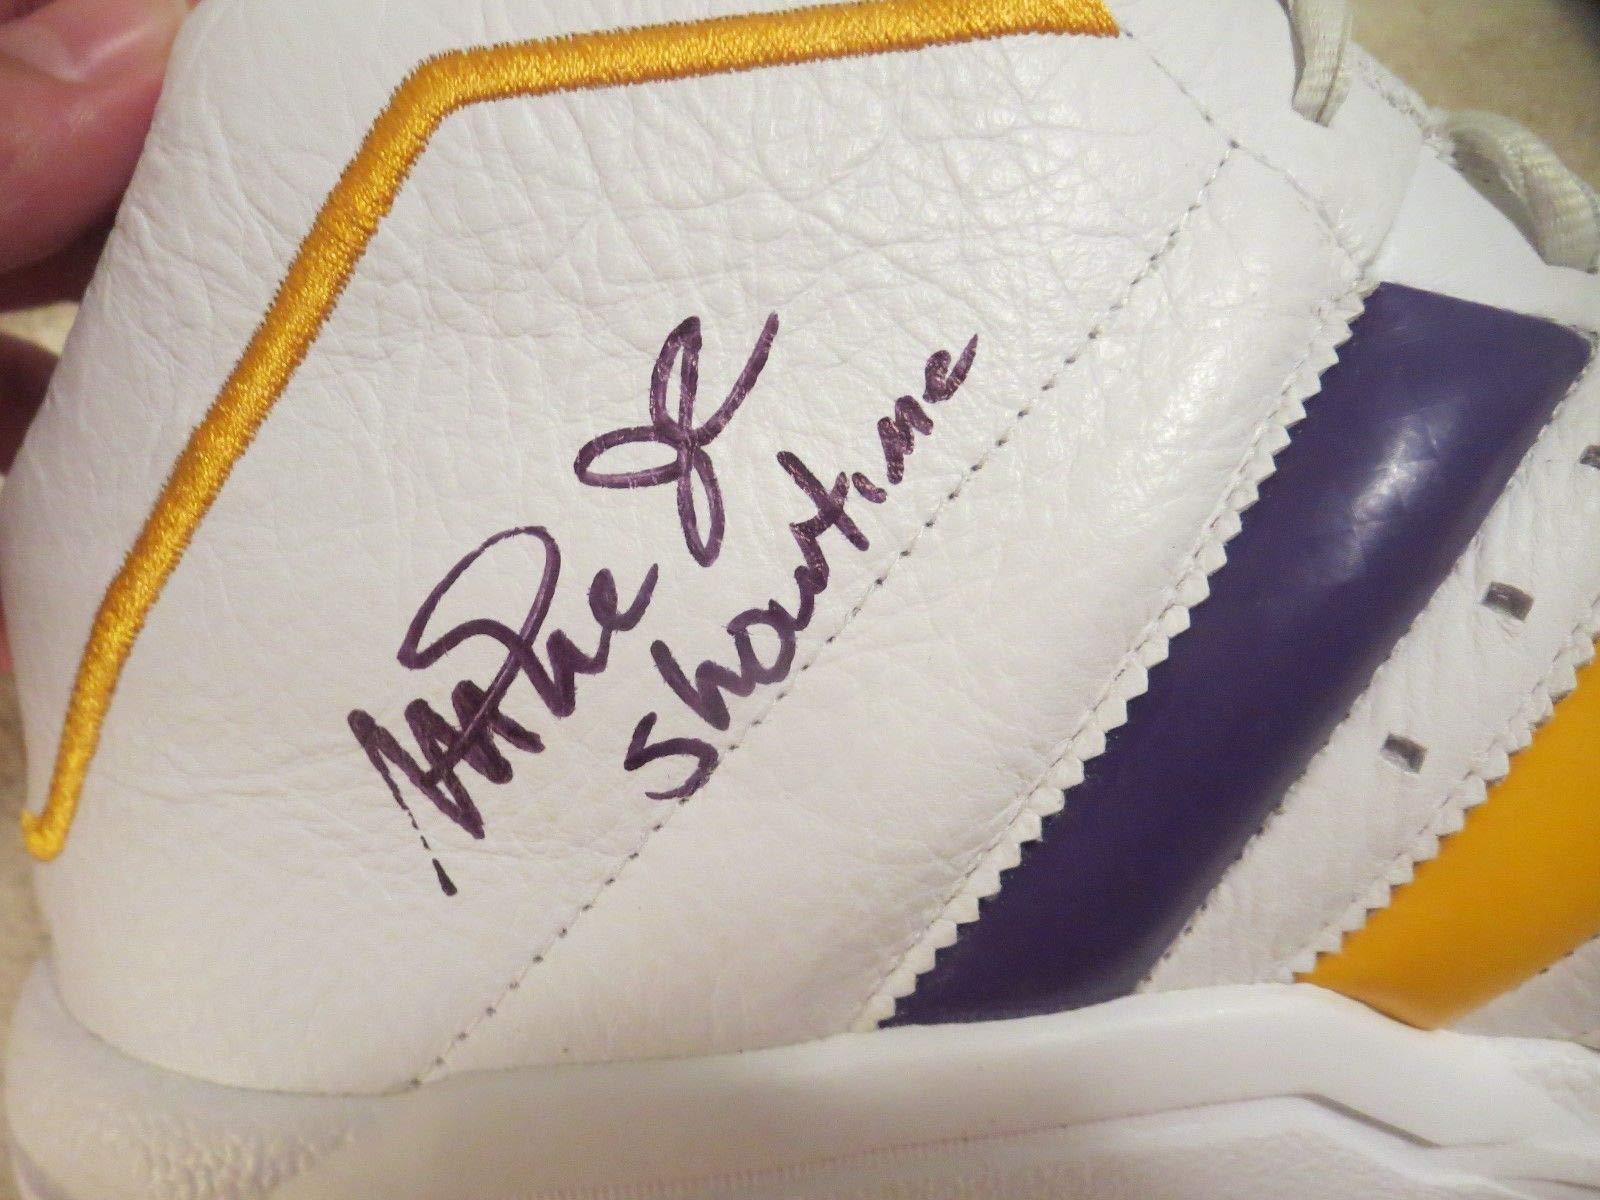 Kareem Abdul Jabbar & Magic Johnson Autographed Signed Memorabilia Shoe Beckett Witness Only 2 On Ebay